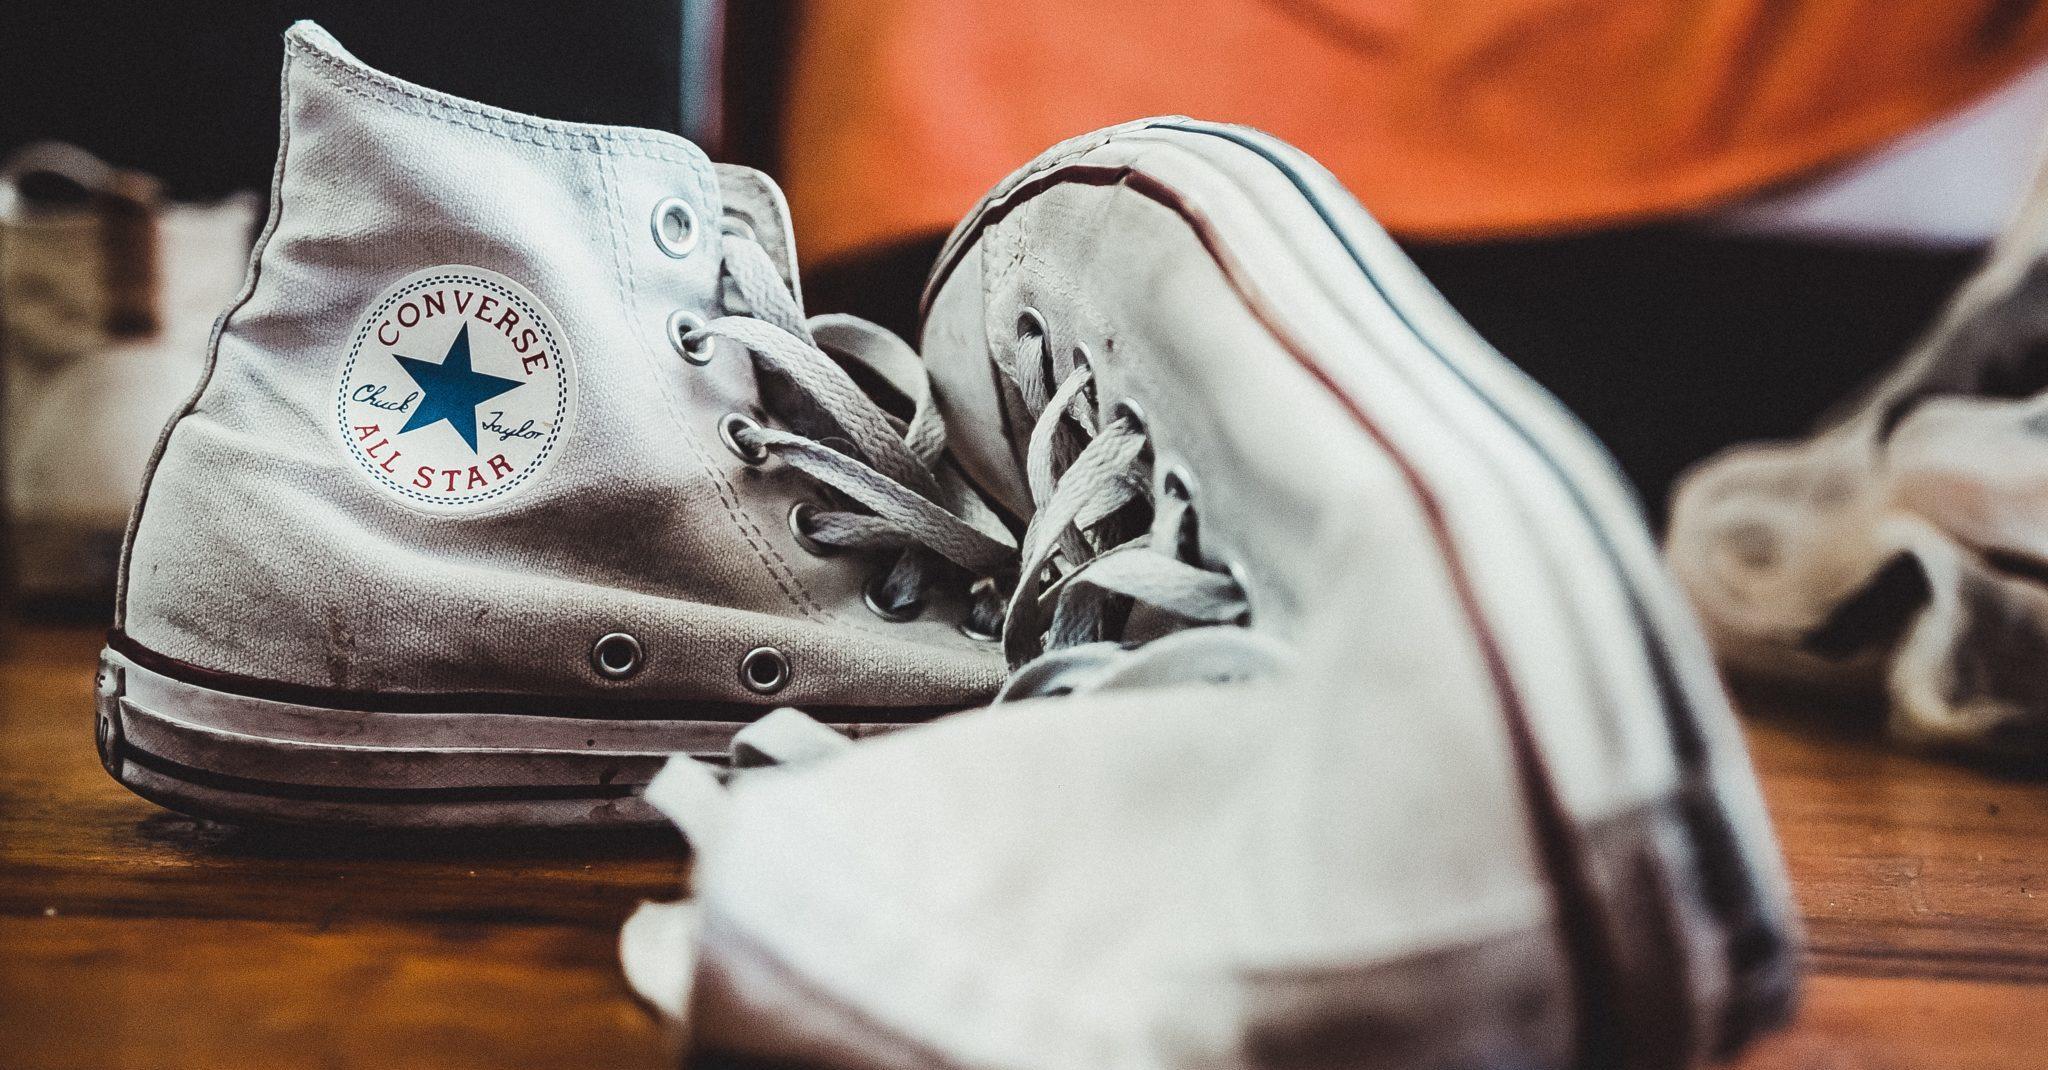 Cómo limpiar las zapatillas blancas Boston's Online Hispanic